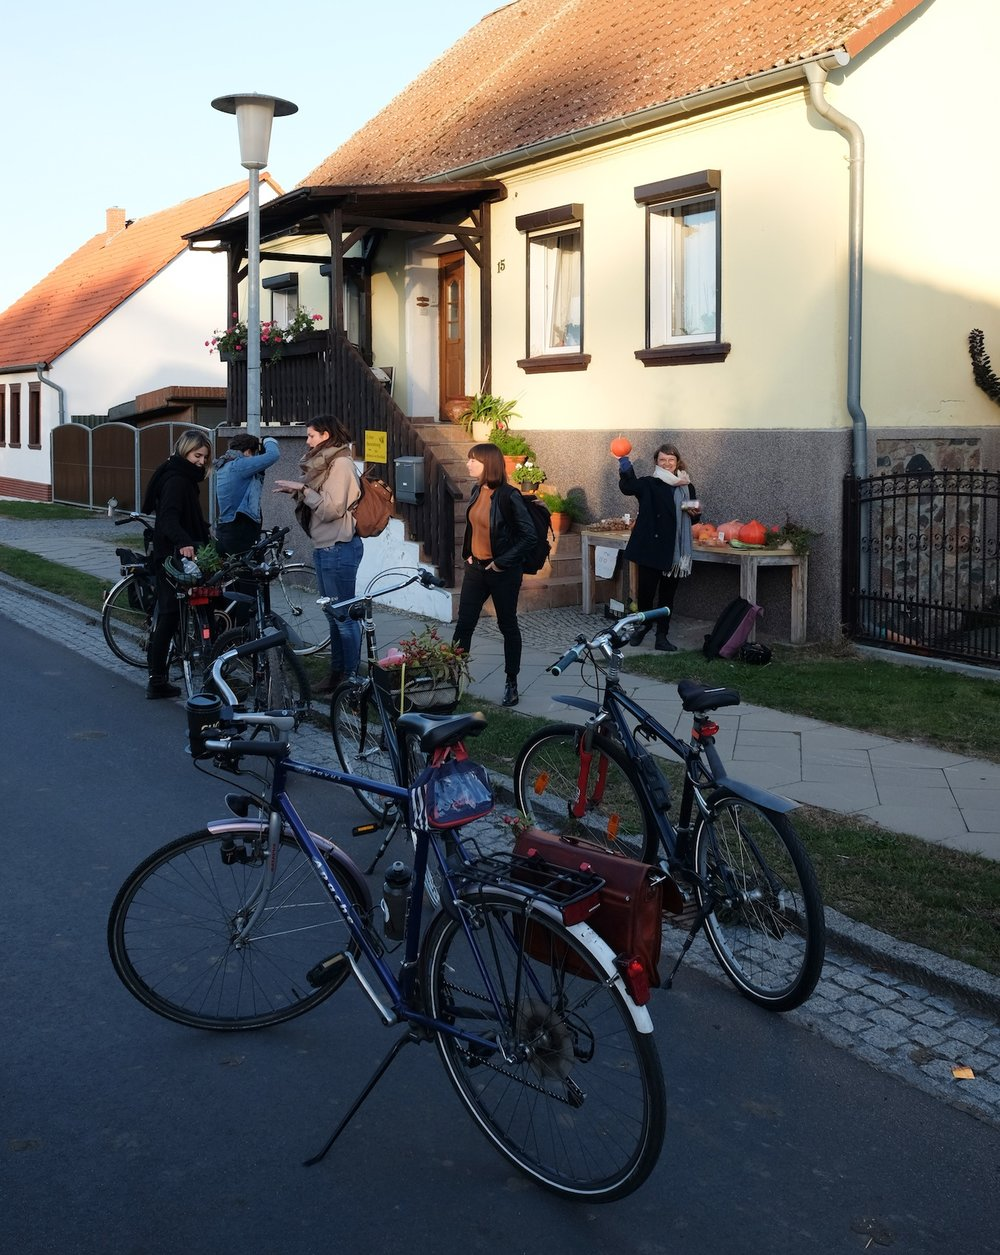 Ribbeck_Radtour_wecyclebrandenburg71.JPG